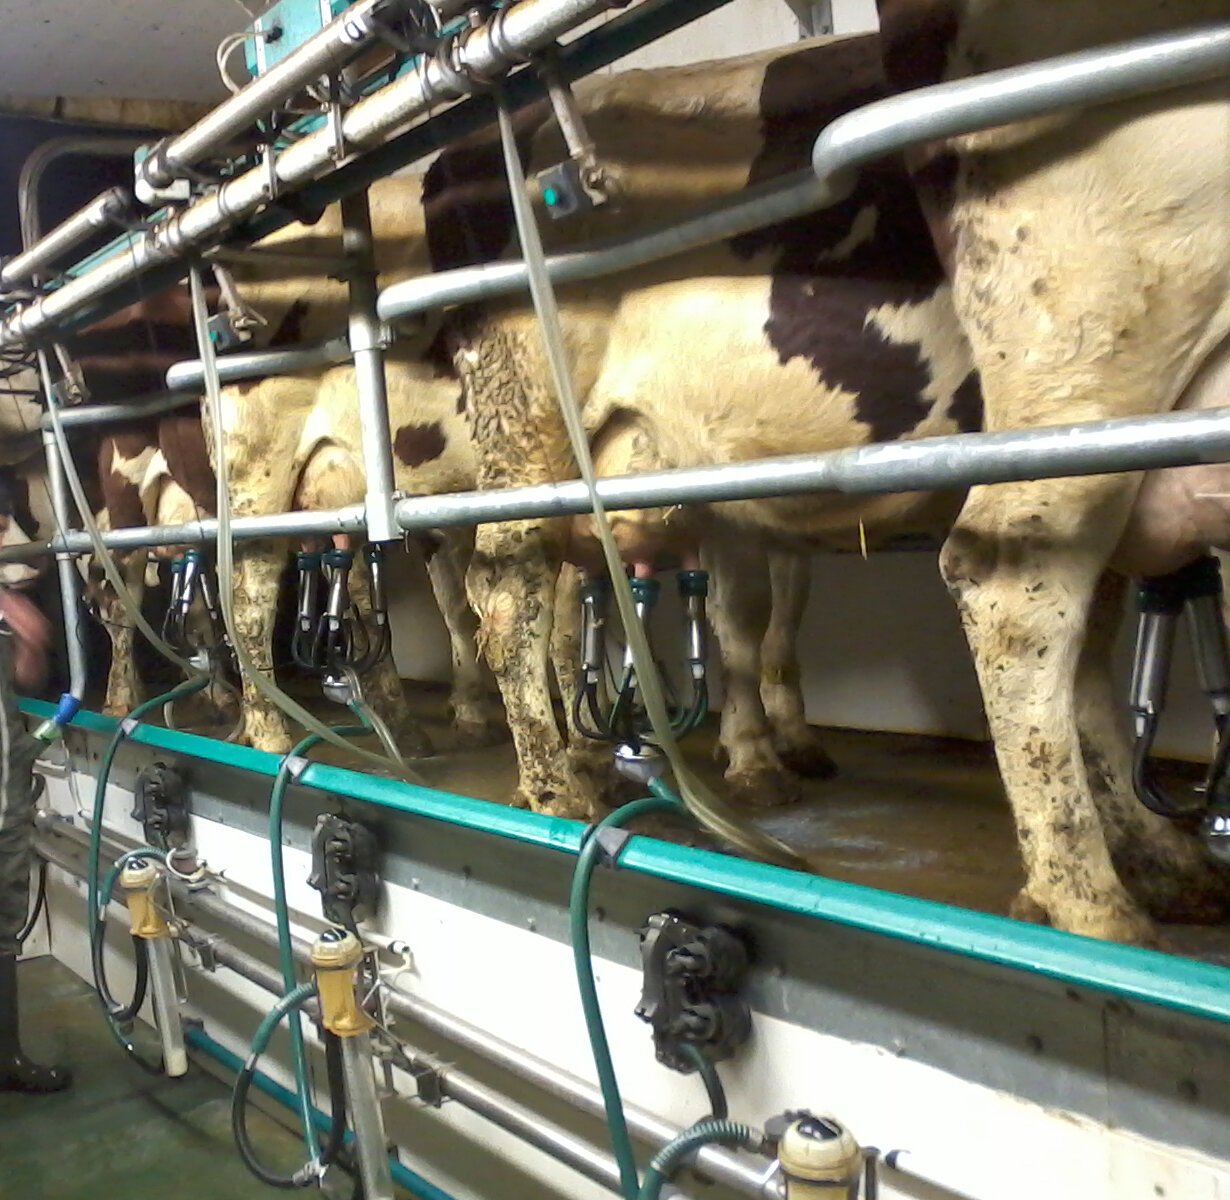 troupeau bovin mal traite